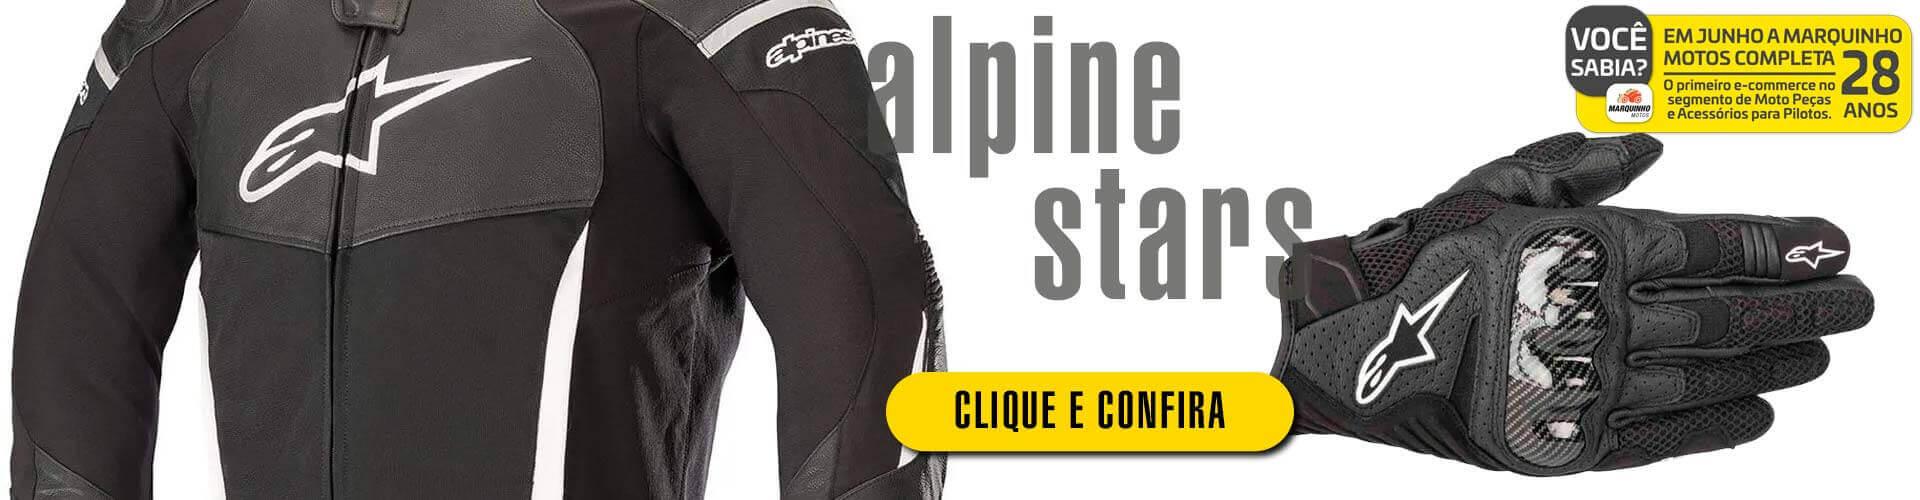 banner principal04 - Alpine